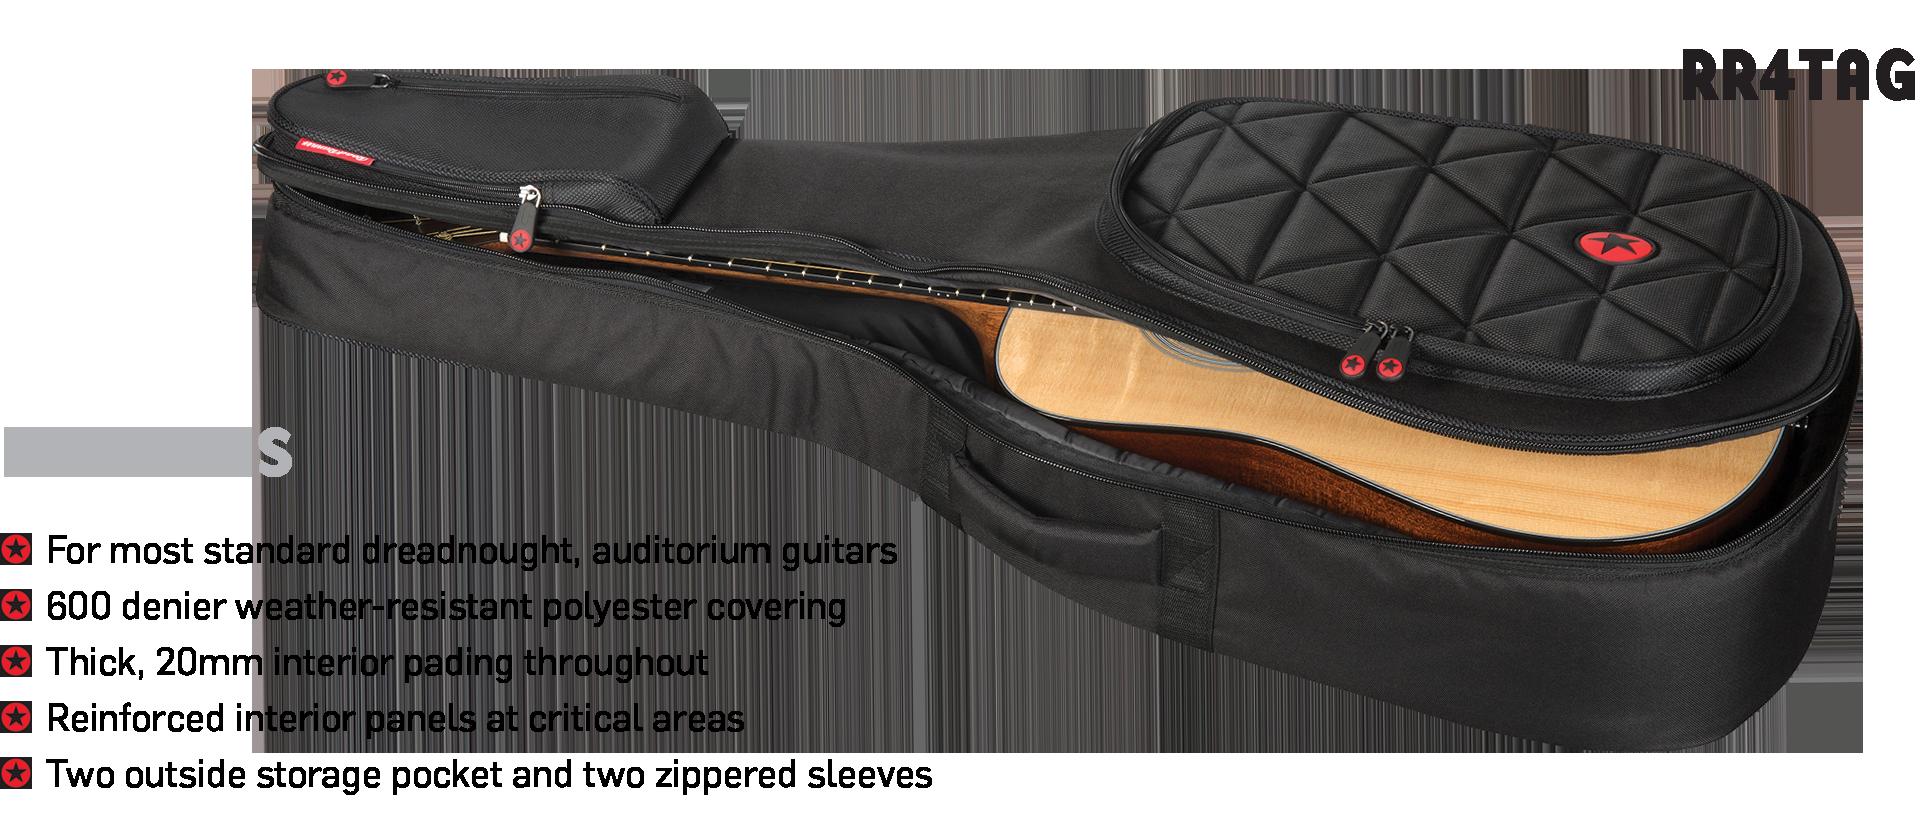 Acoustic Guitar Padded Gig Bag Road Runner Boulevard RR4TAG